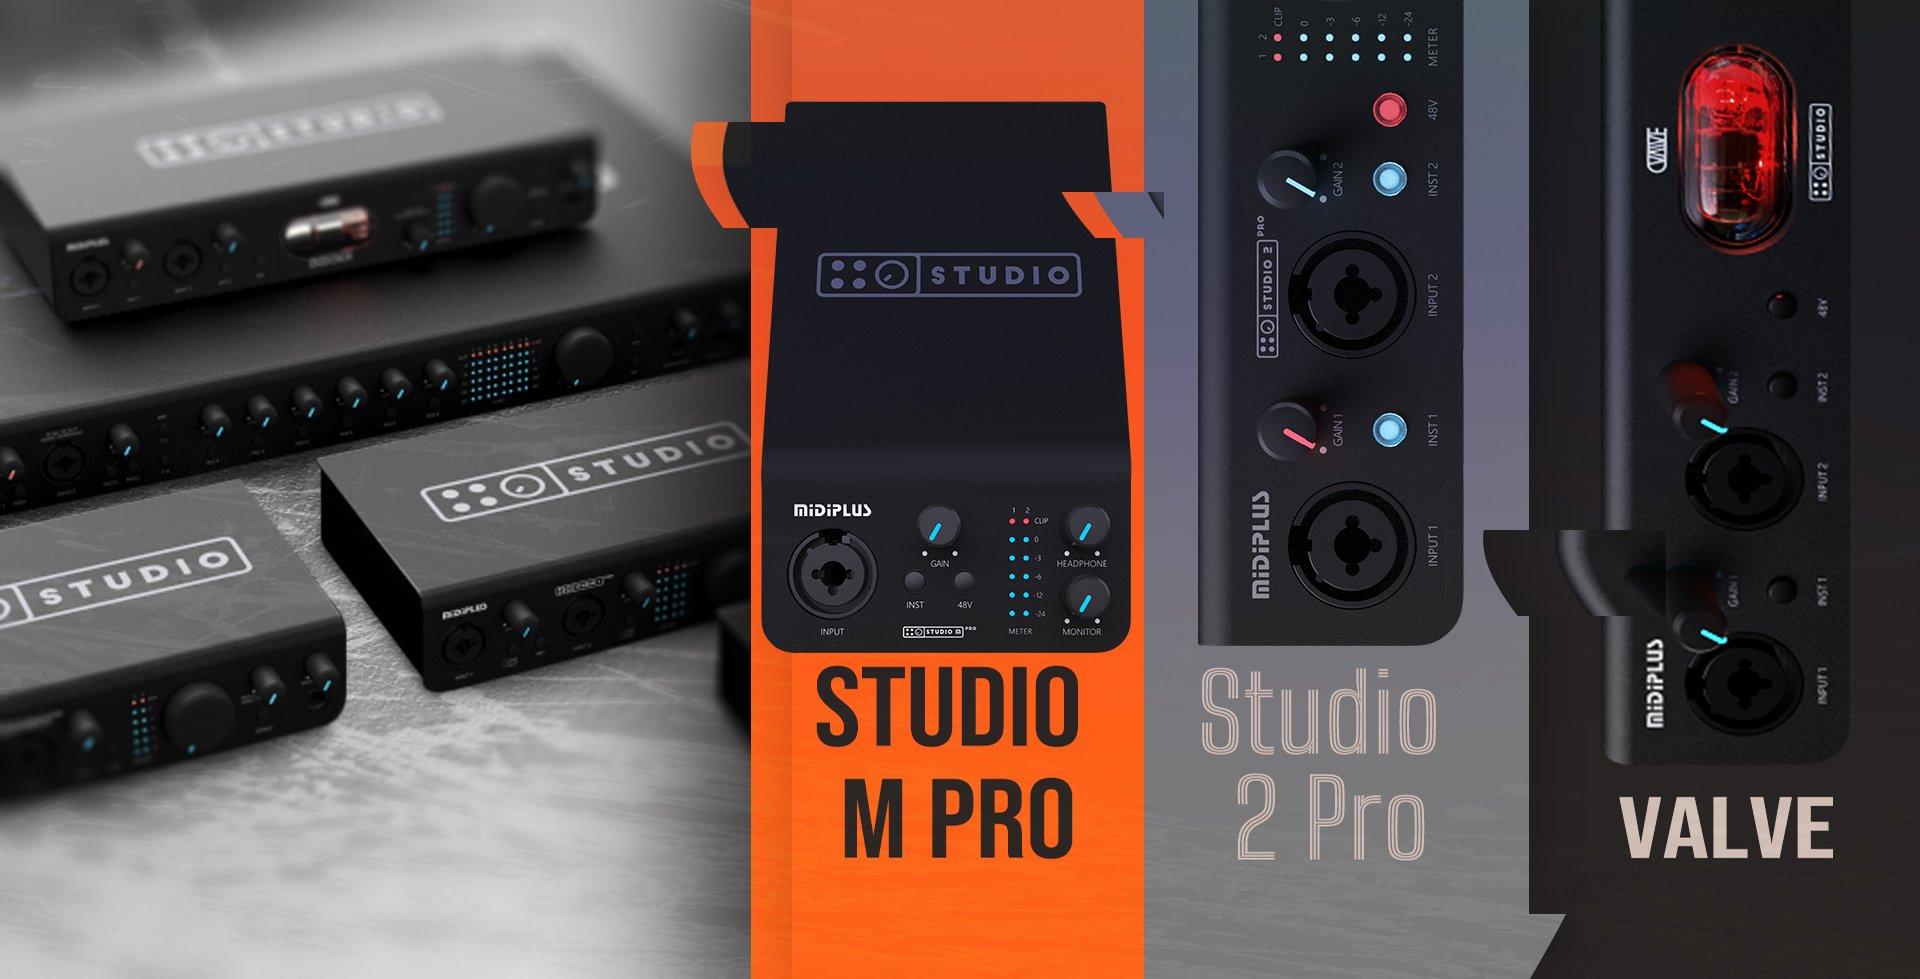 Studio M Pro  2 Pro  Valve系列